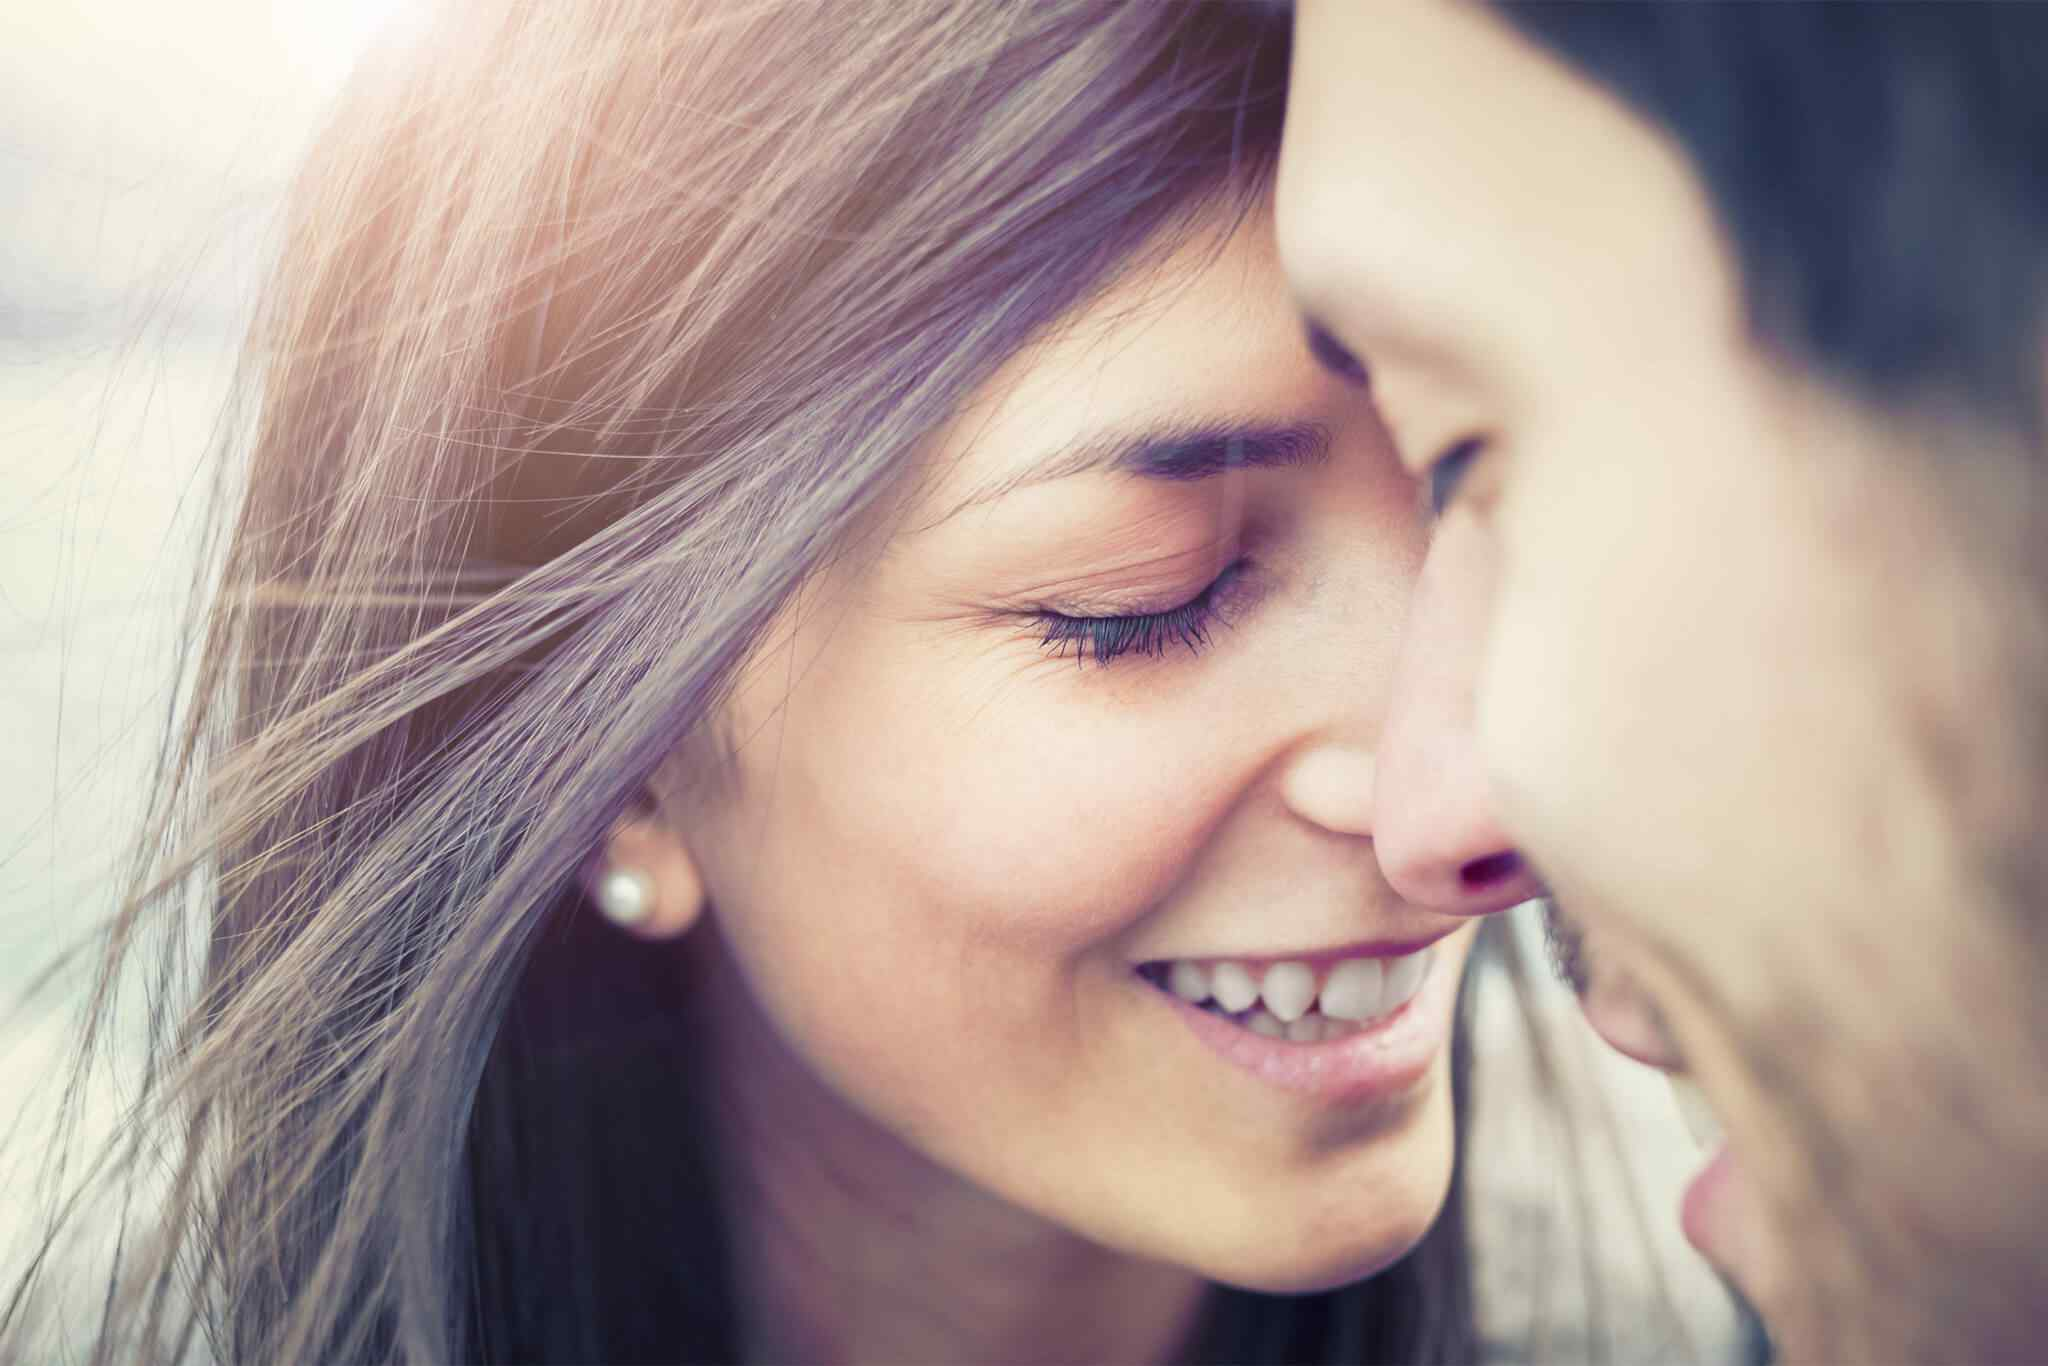 https://sscpa.com.au/wp-content/uploads/2018/01/img-class-marriage-01.jpg